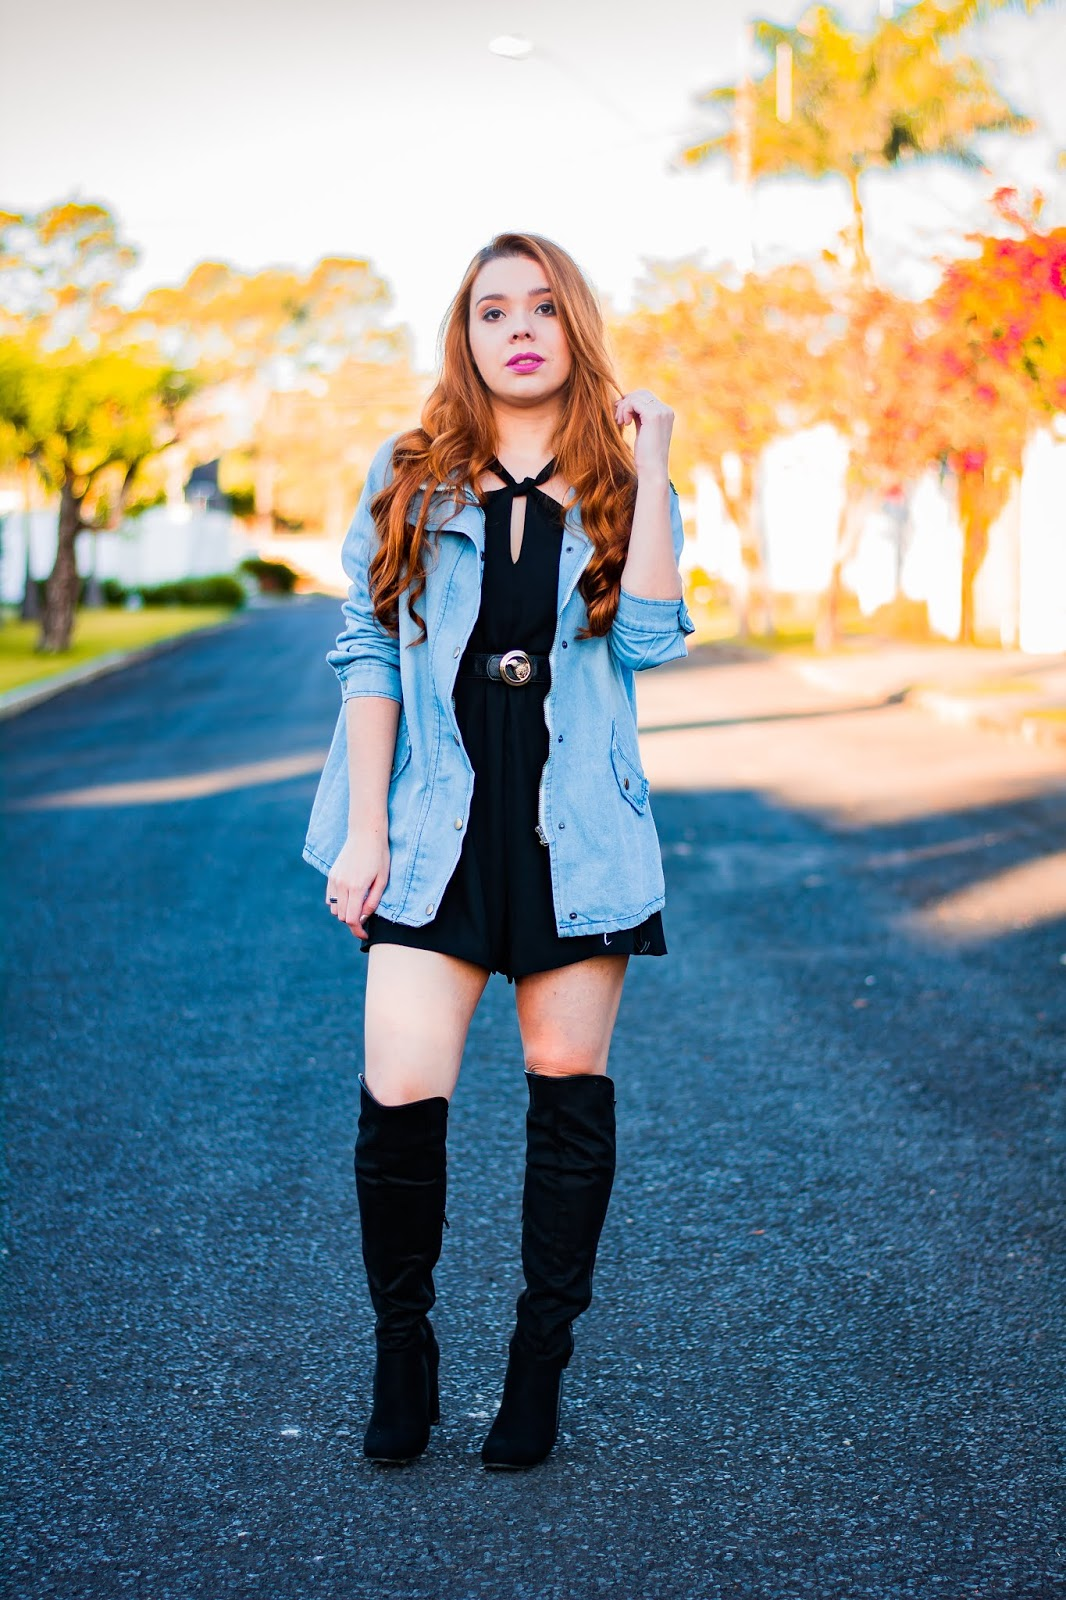 Vestido preto com jaqueta jeans na cintura